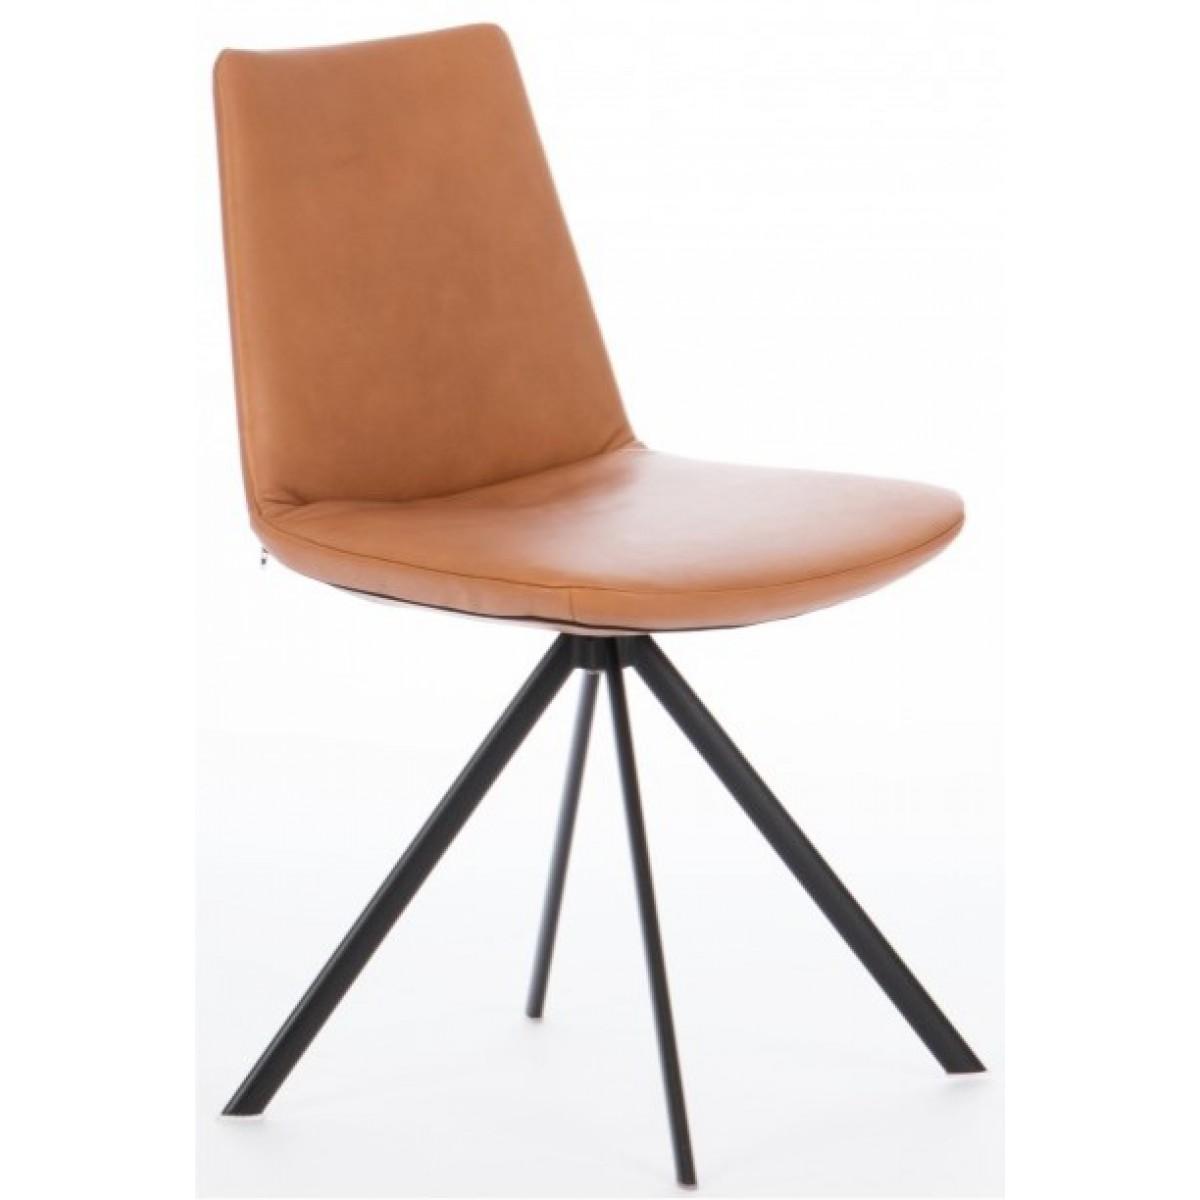 sheriff-stoel-draaibaar-leer-zwart-frame-elips